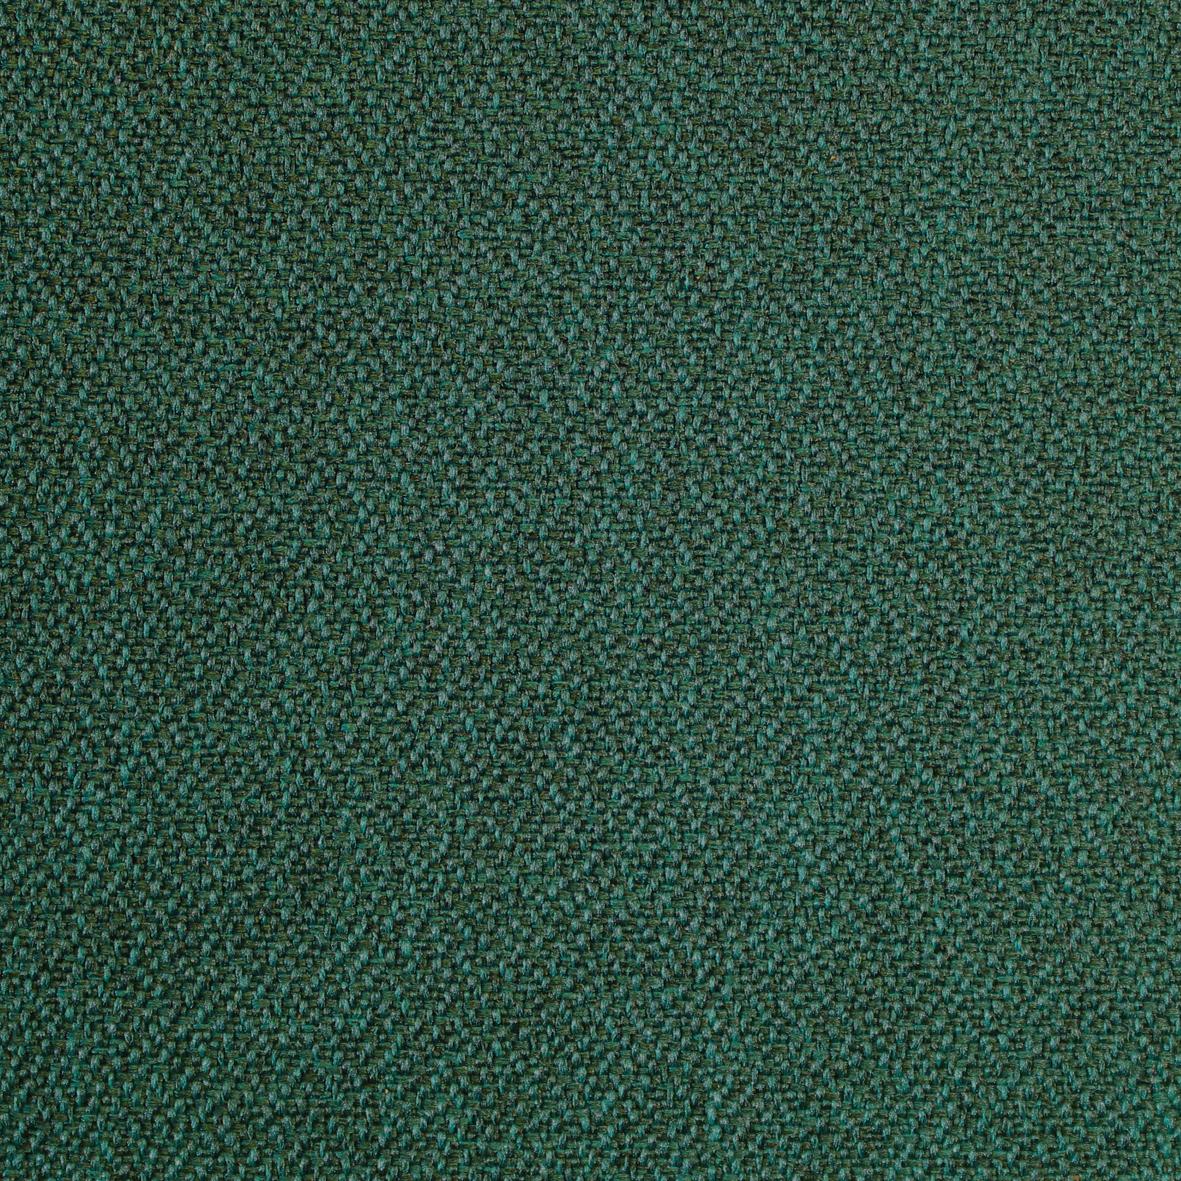 New workplace fabric — Tierra